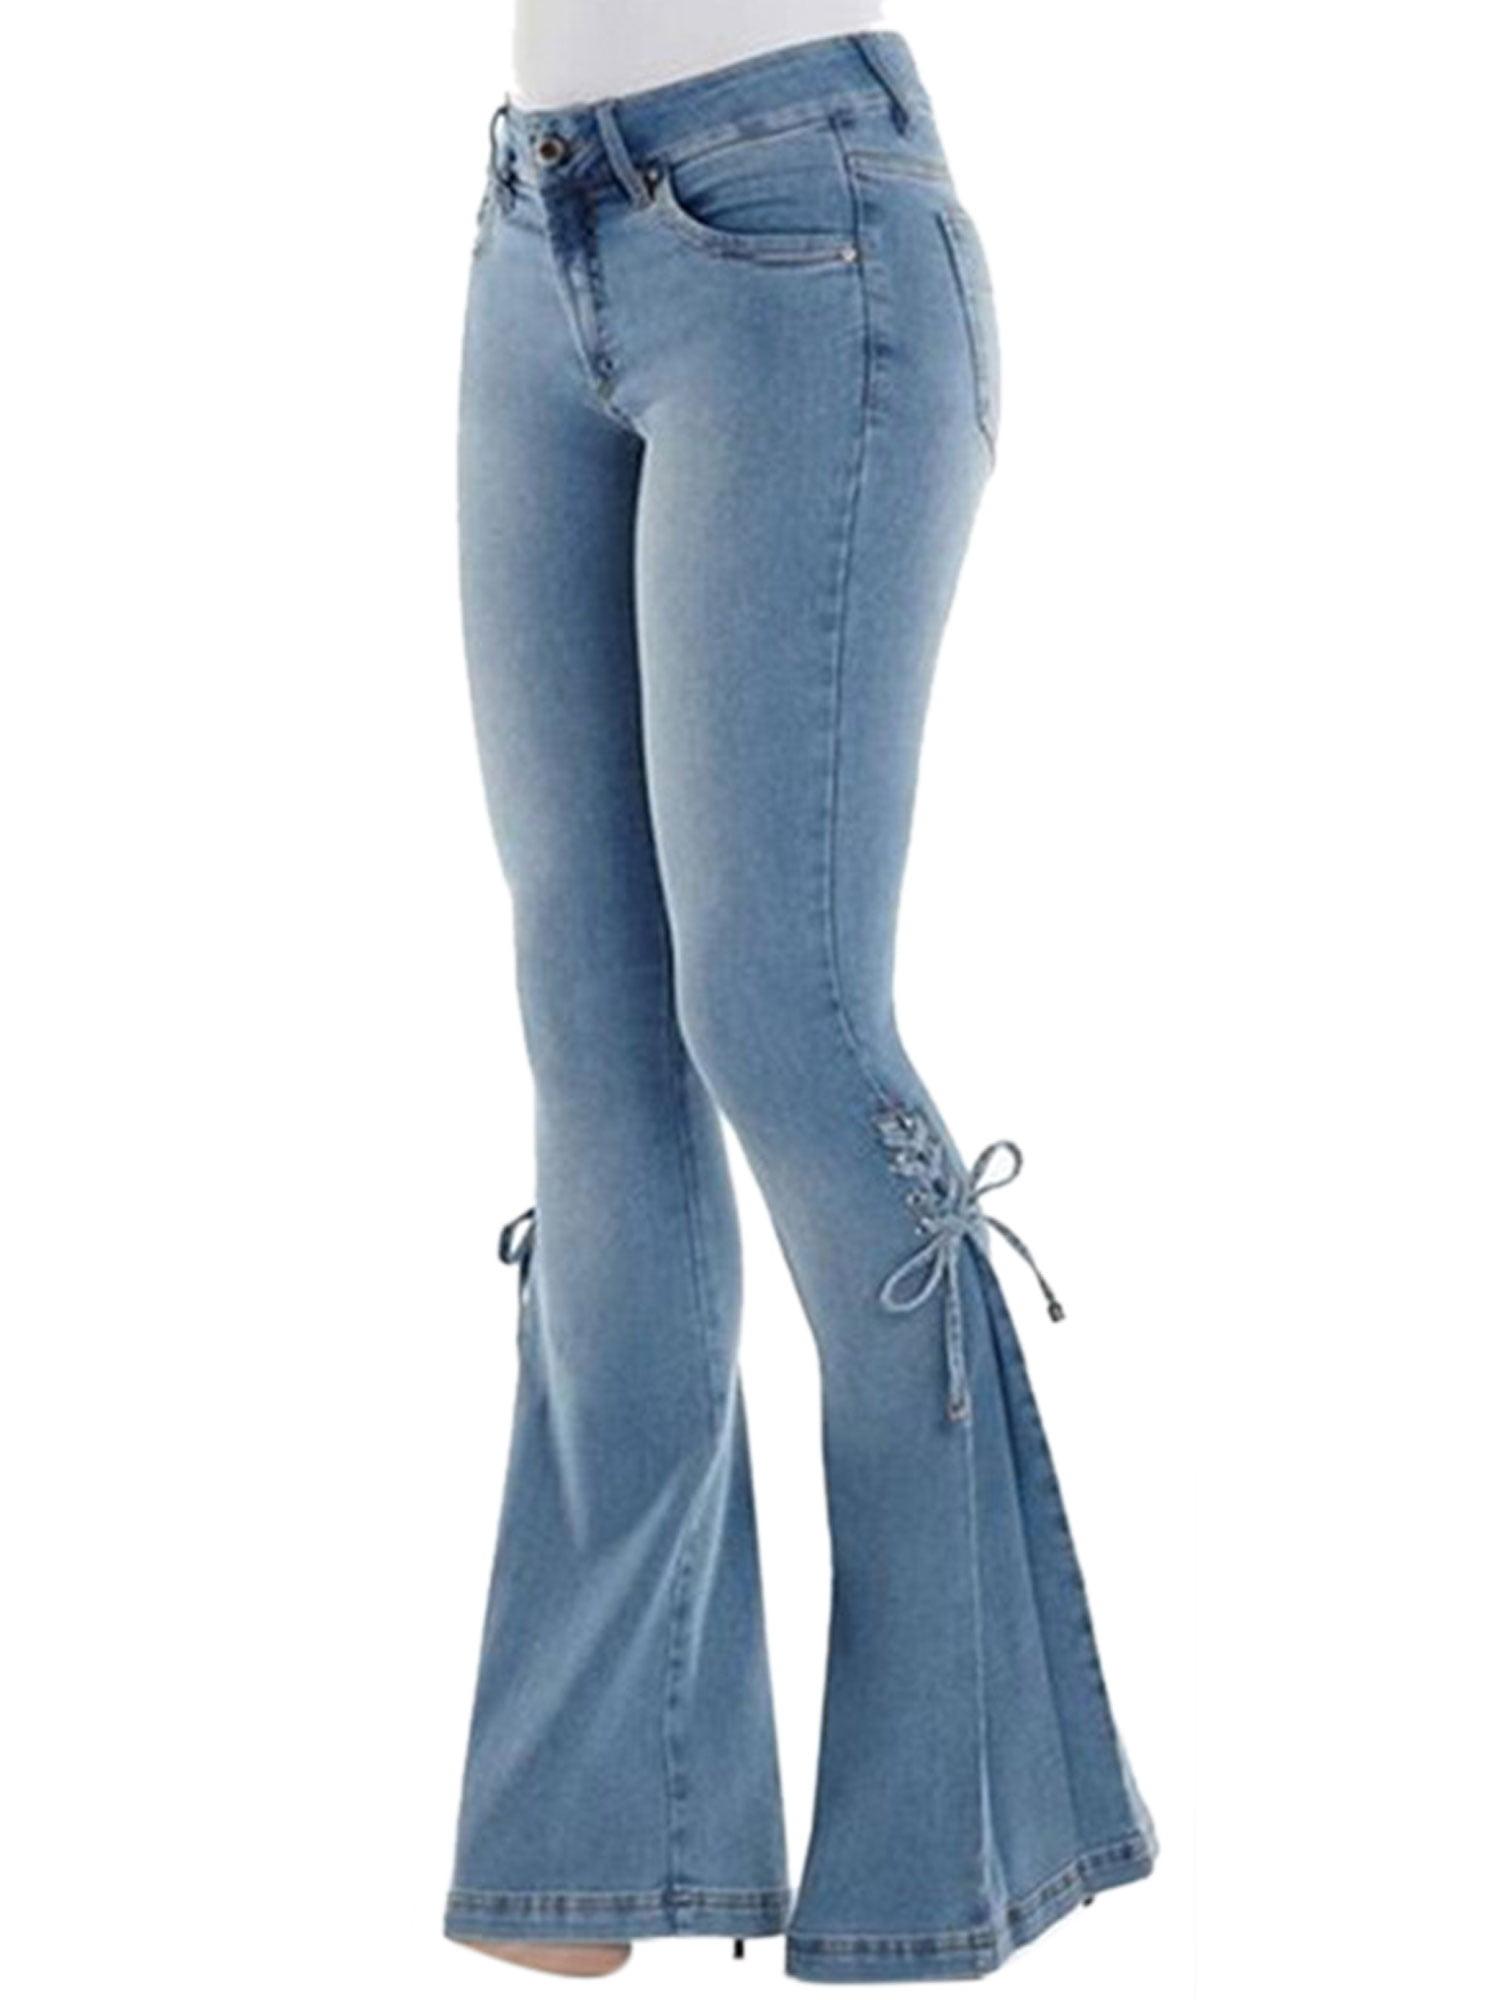 Hot Sale Kids Baby Girls Jeans Vintage Bell-bottom Trousers Wide leg Denim Pants